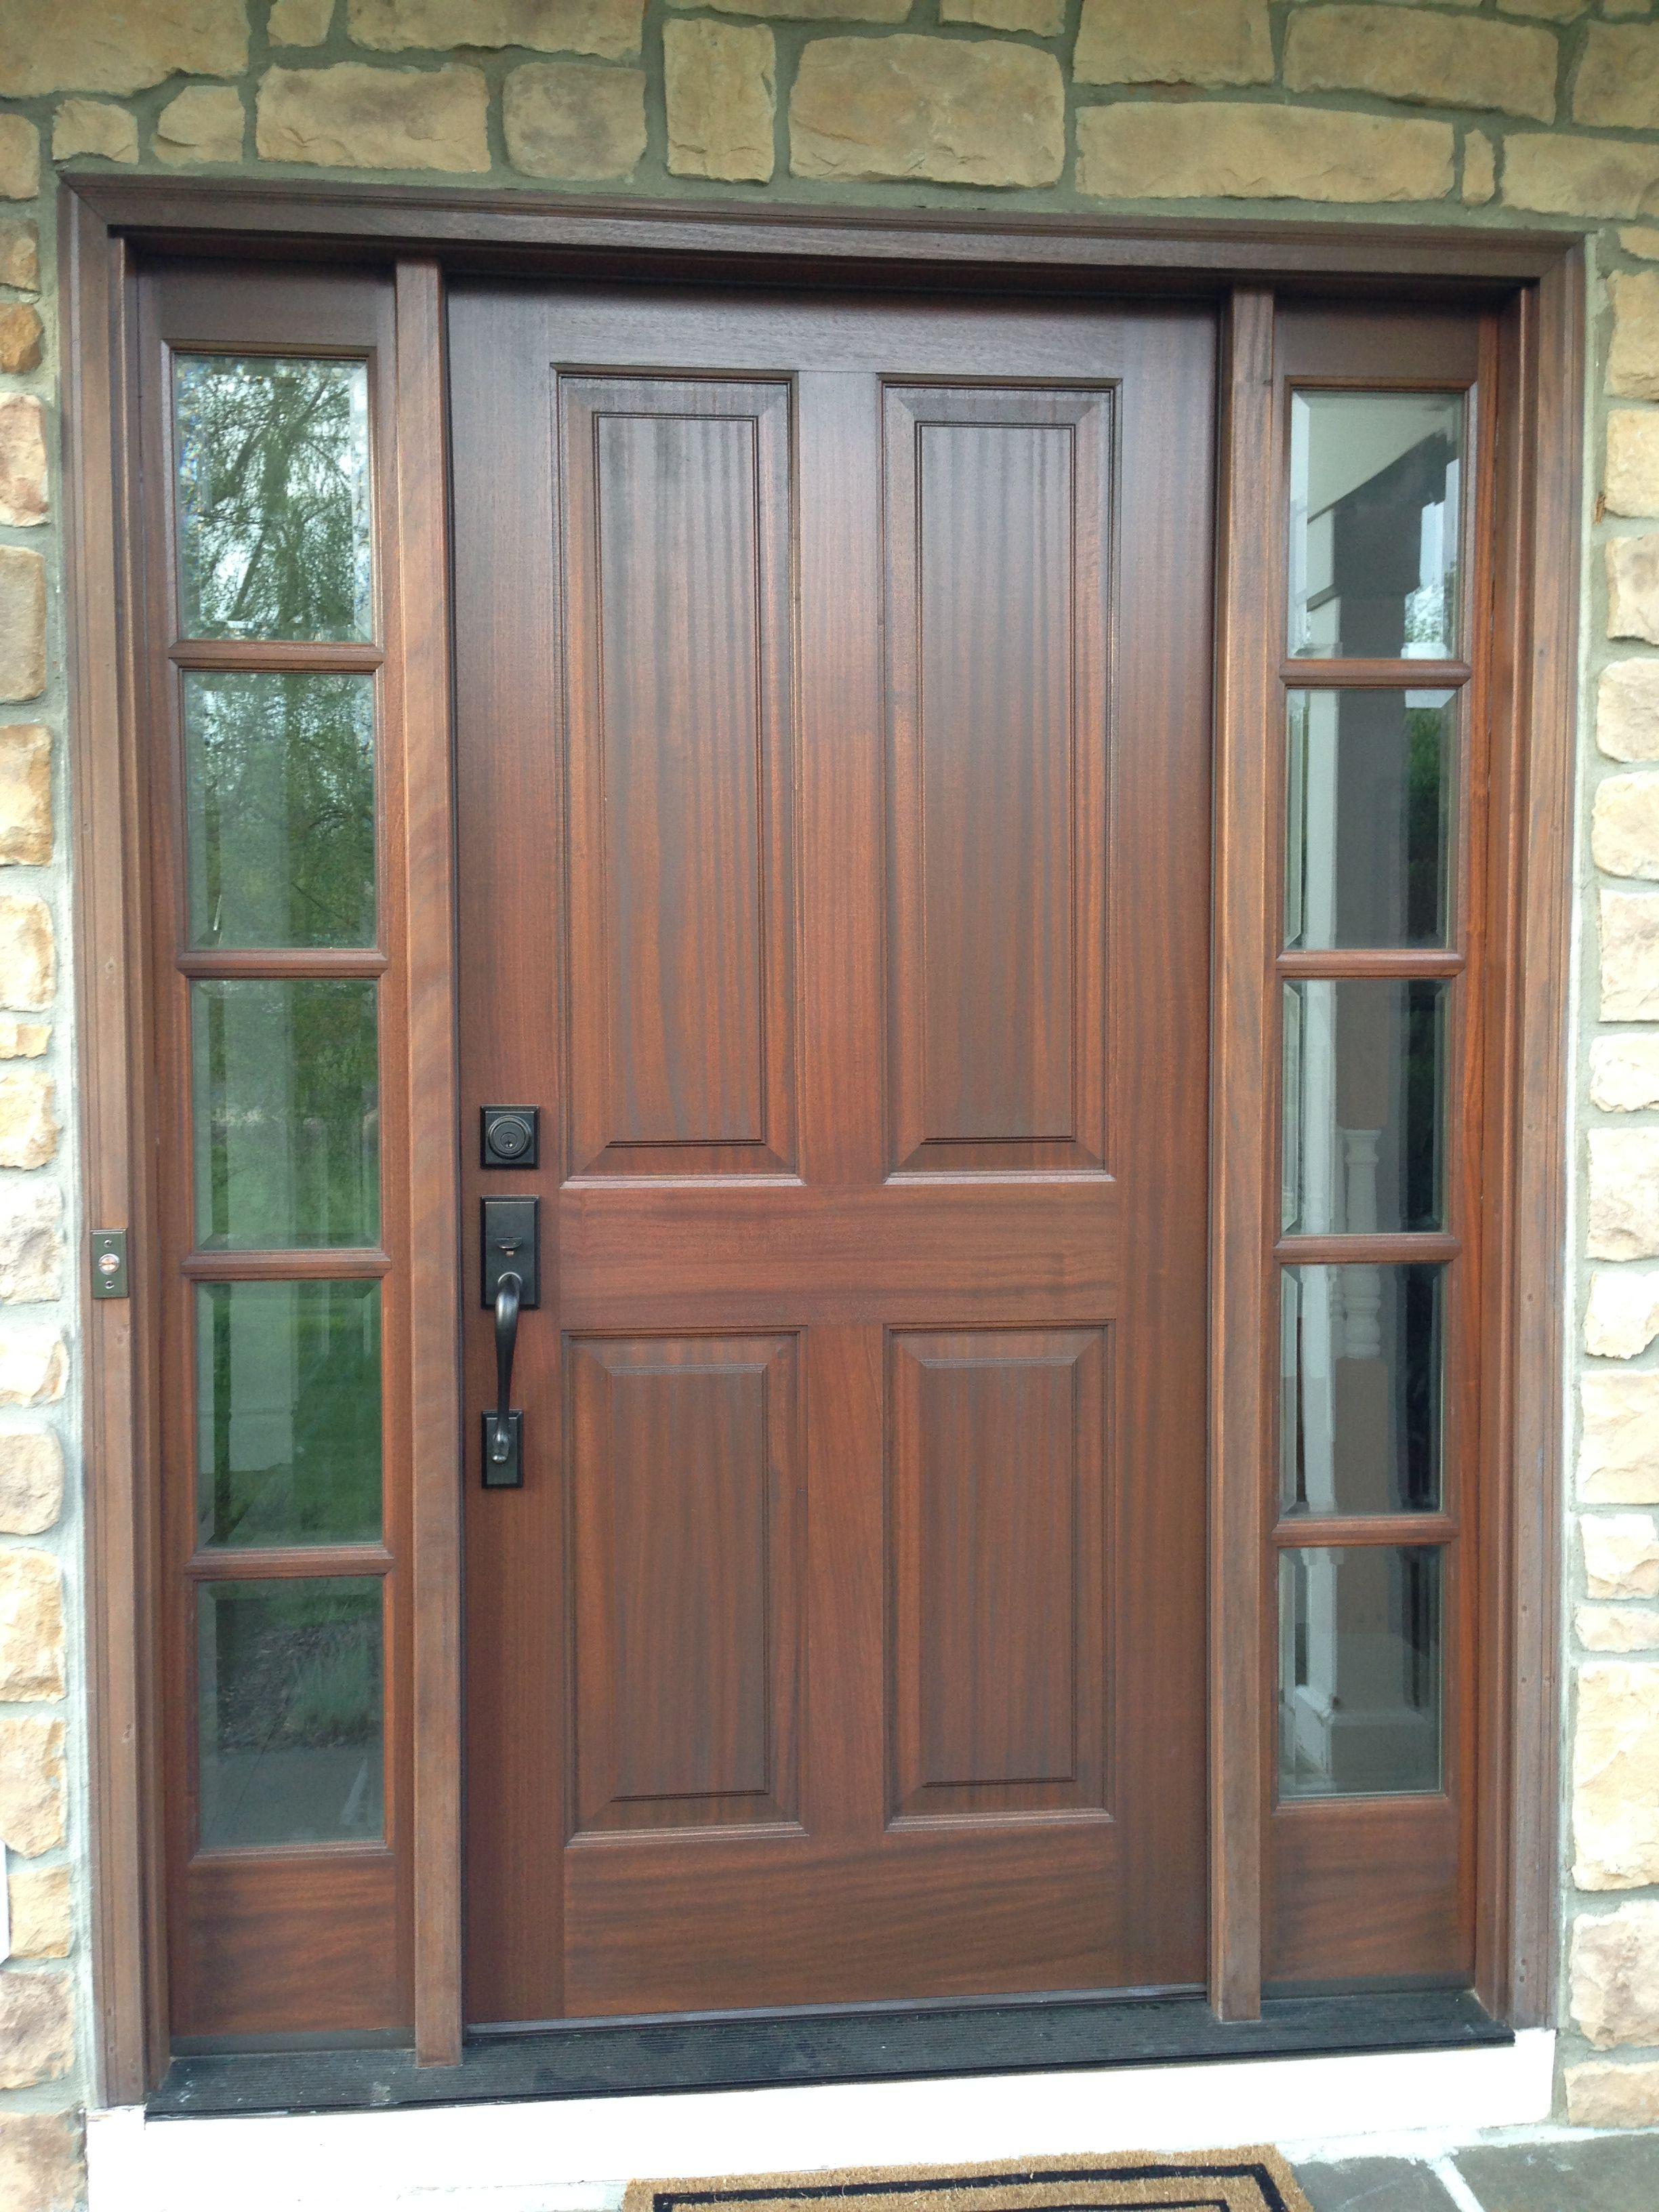 Mahogany Front Door system & Mahogany Front Door system | Reno Ideas | Pinterest | Front doors ...